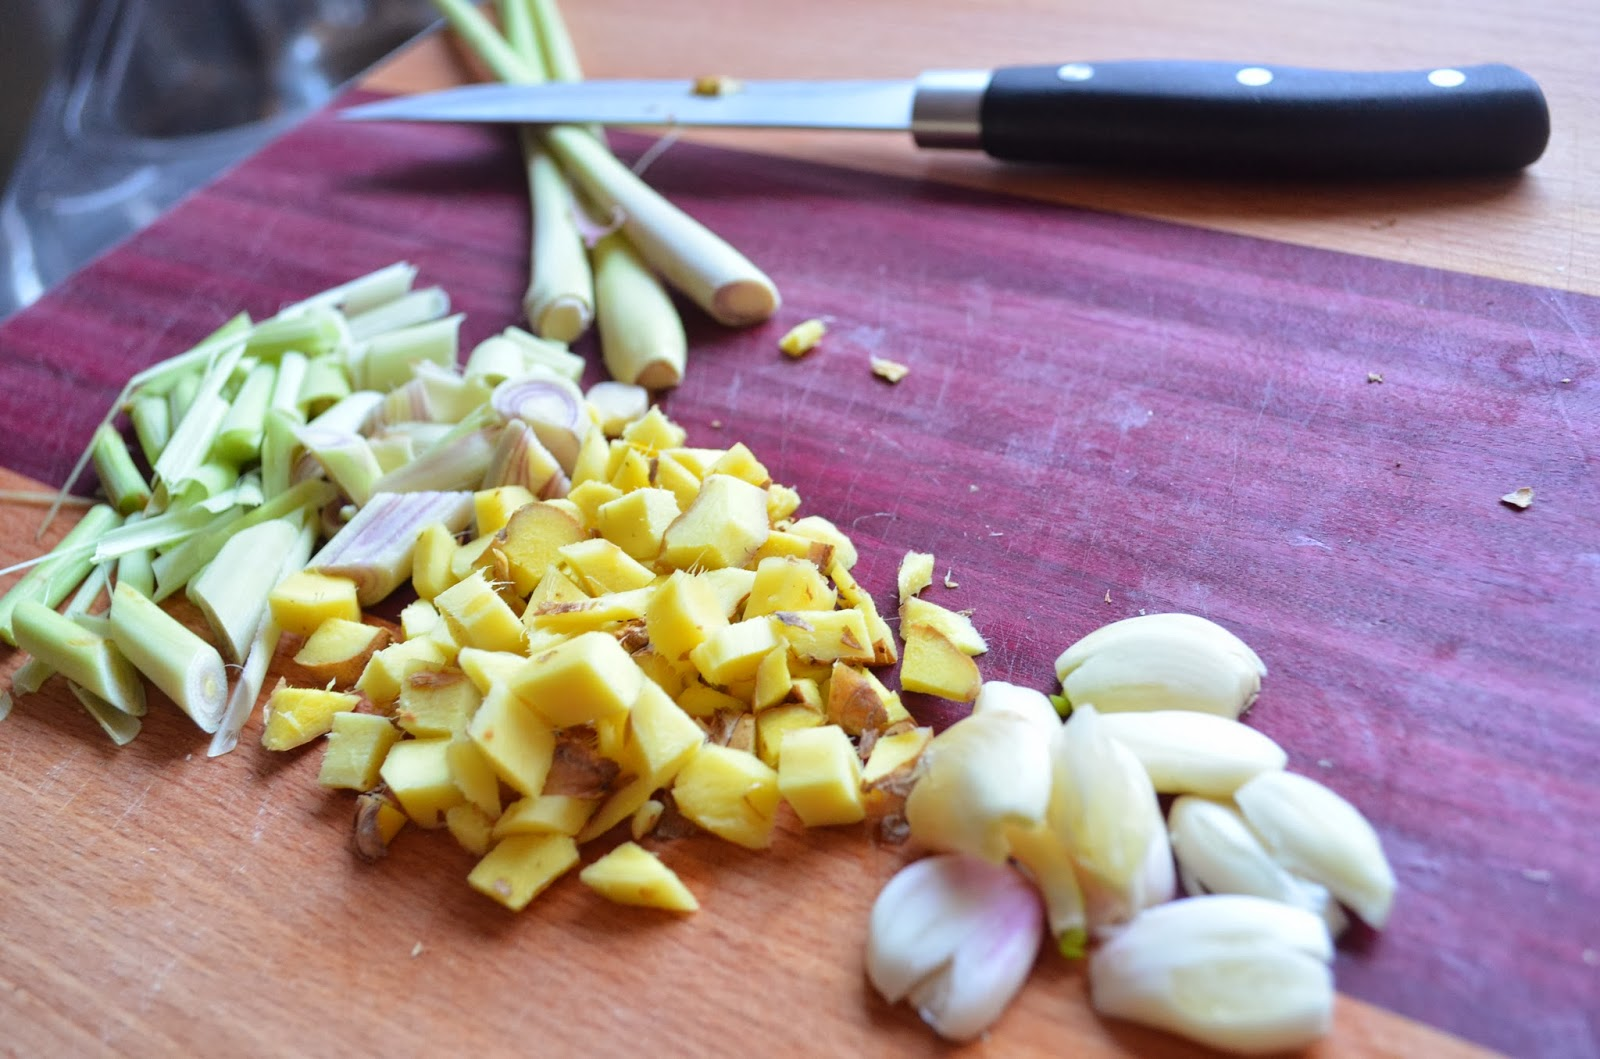 vegan cooking kokos zitronengrassuppe mit gem se. Black Bedroom Furniture Sets. Home Design Ideas